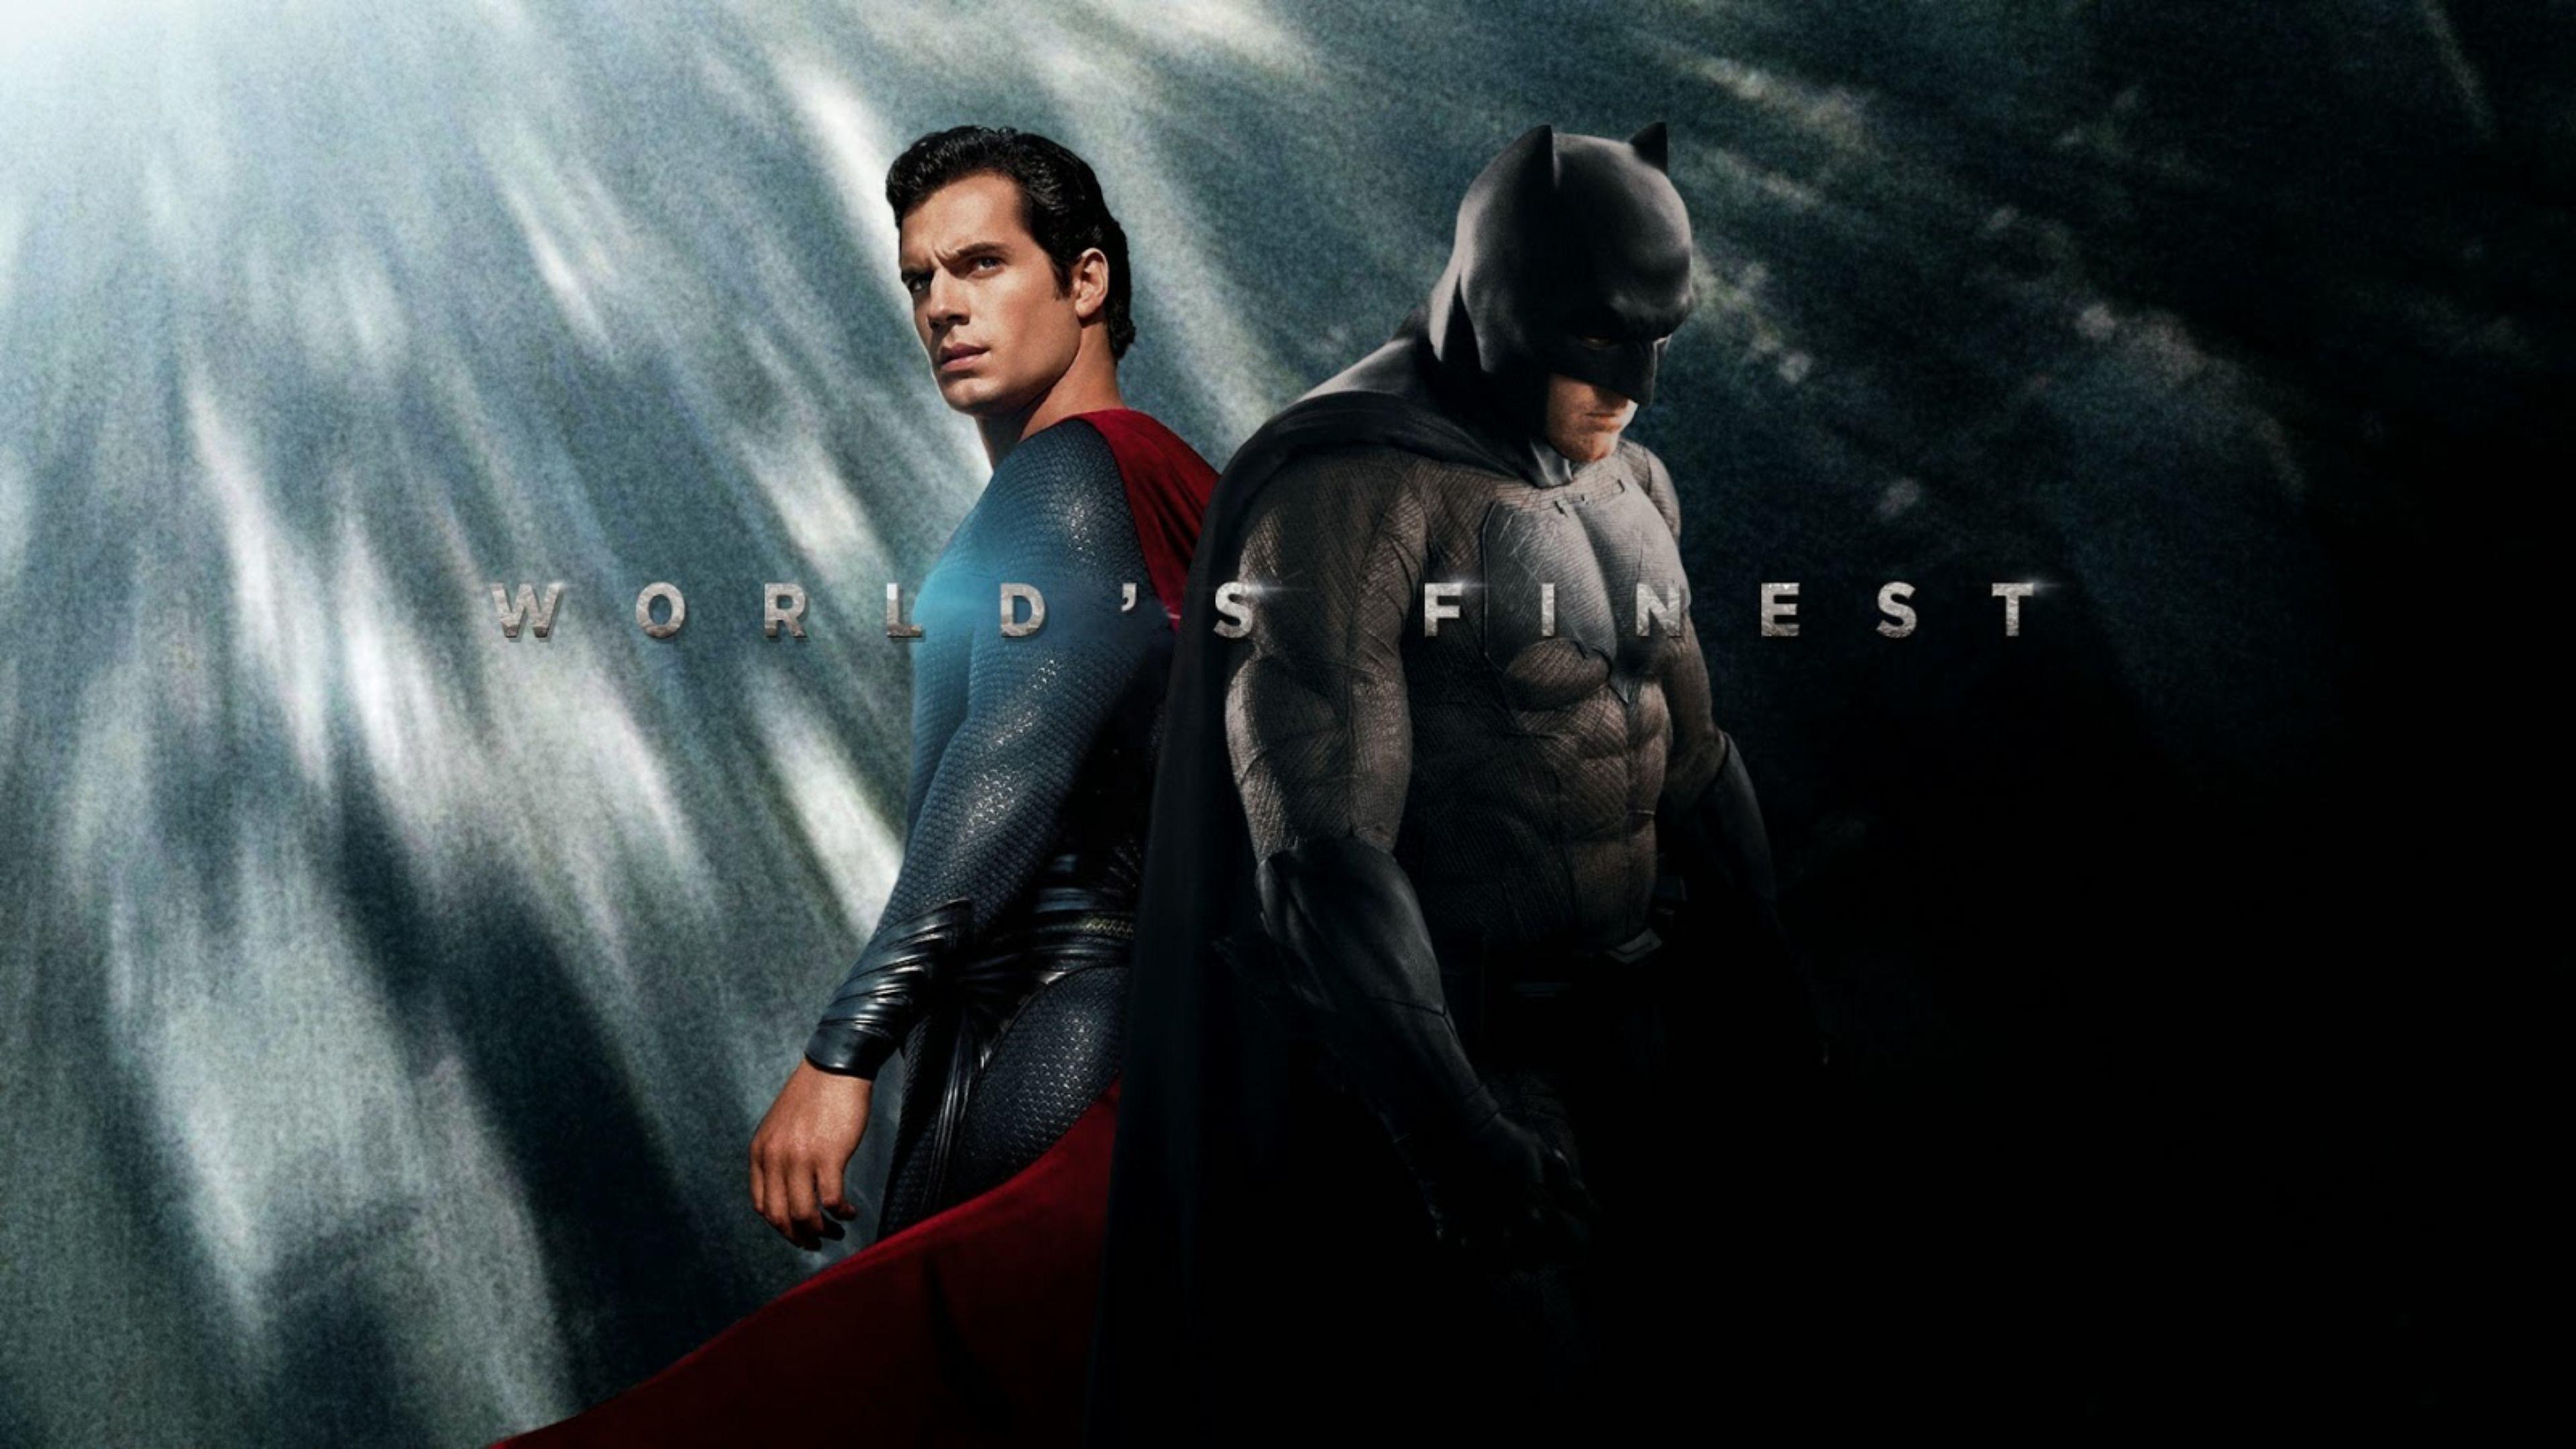 3840x2160 Worlds Finest Batman V Superman Movie 4K Wallpaper Download Super Heroes Wallpapers